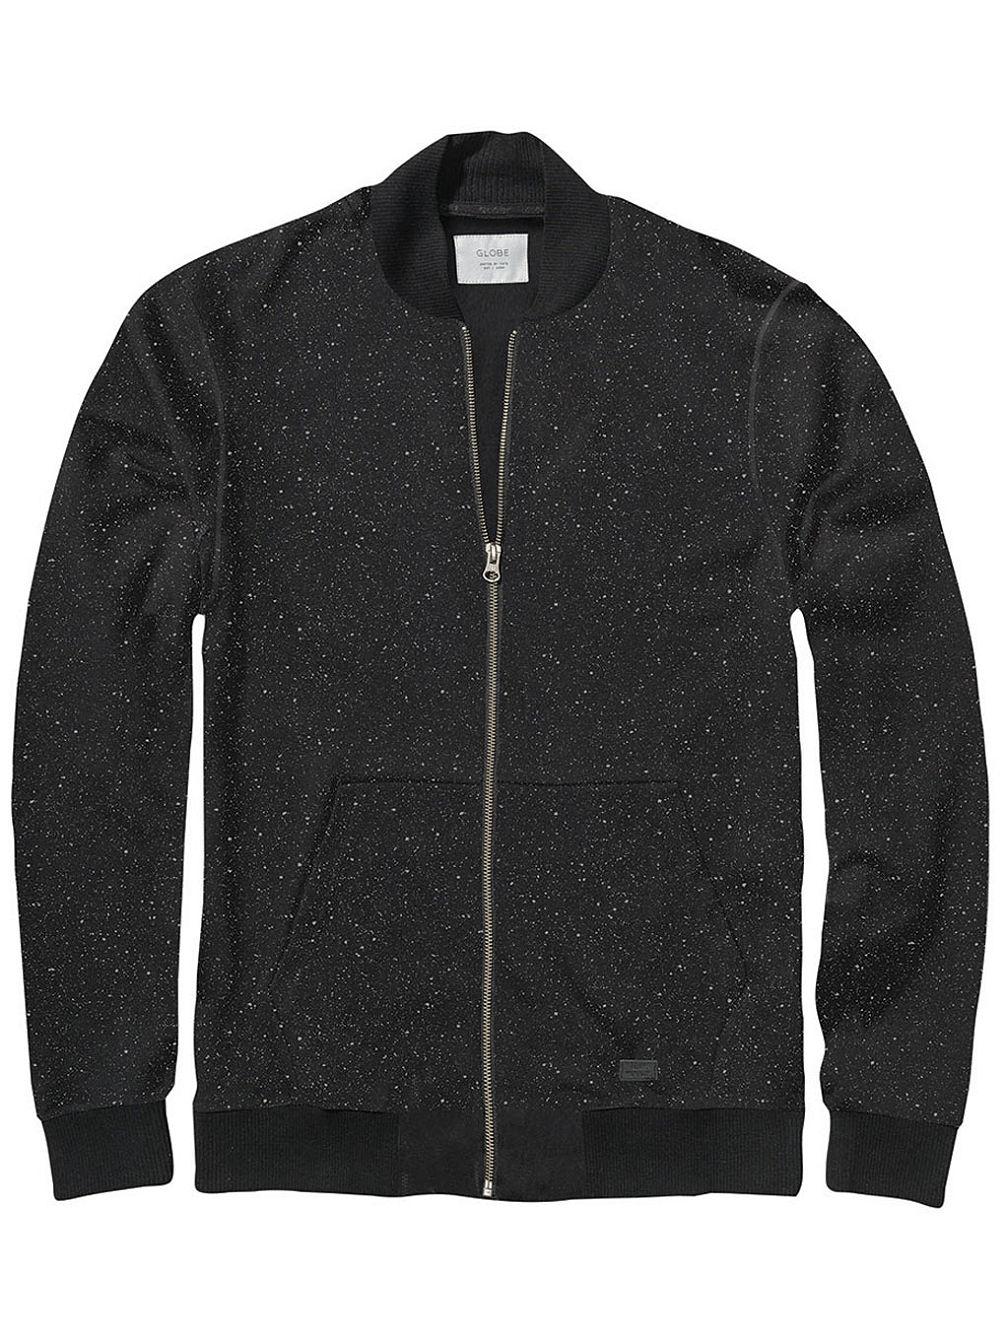 globe-gardiner-jacket